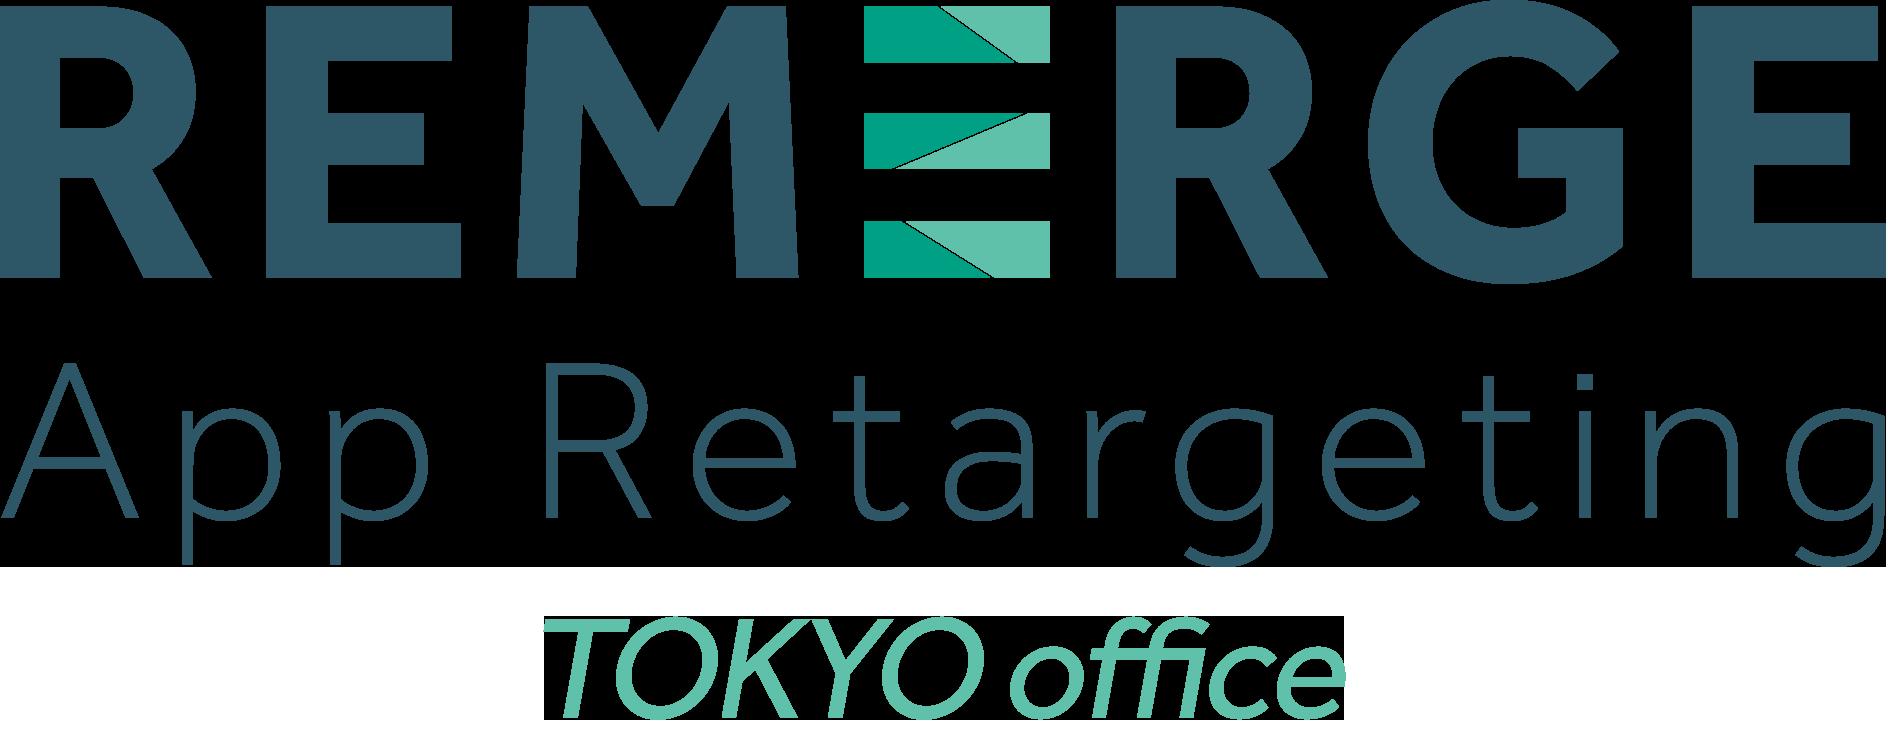 REMERGE Tokyo